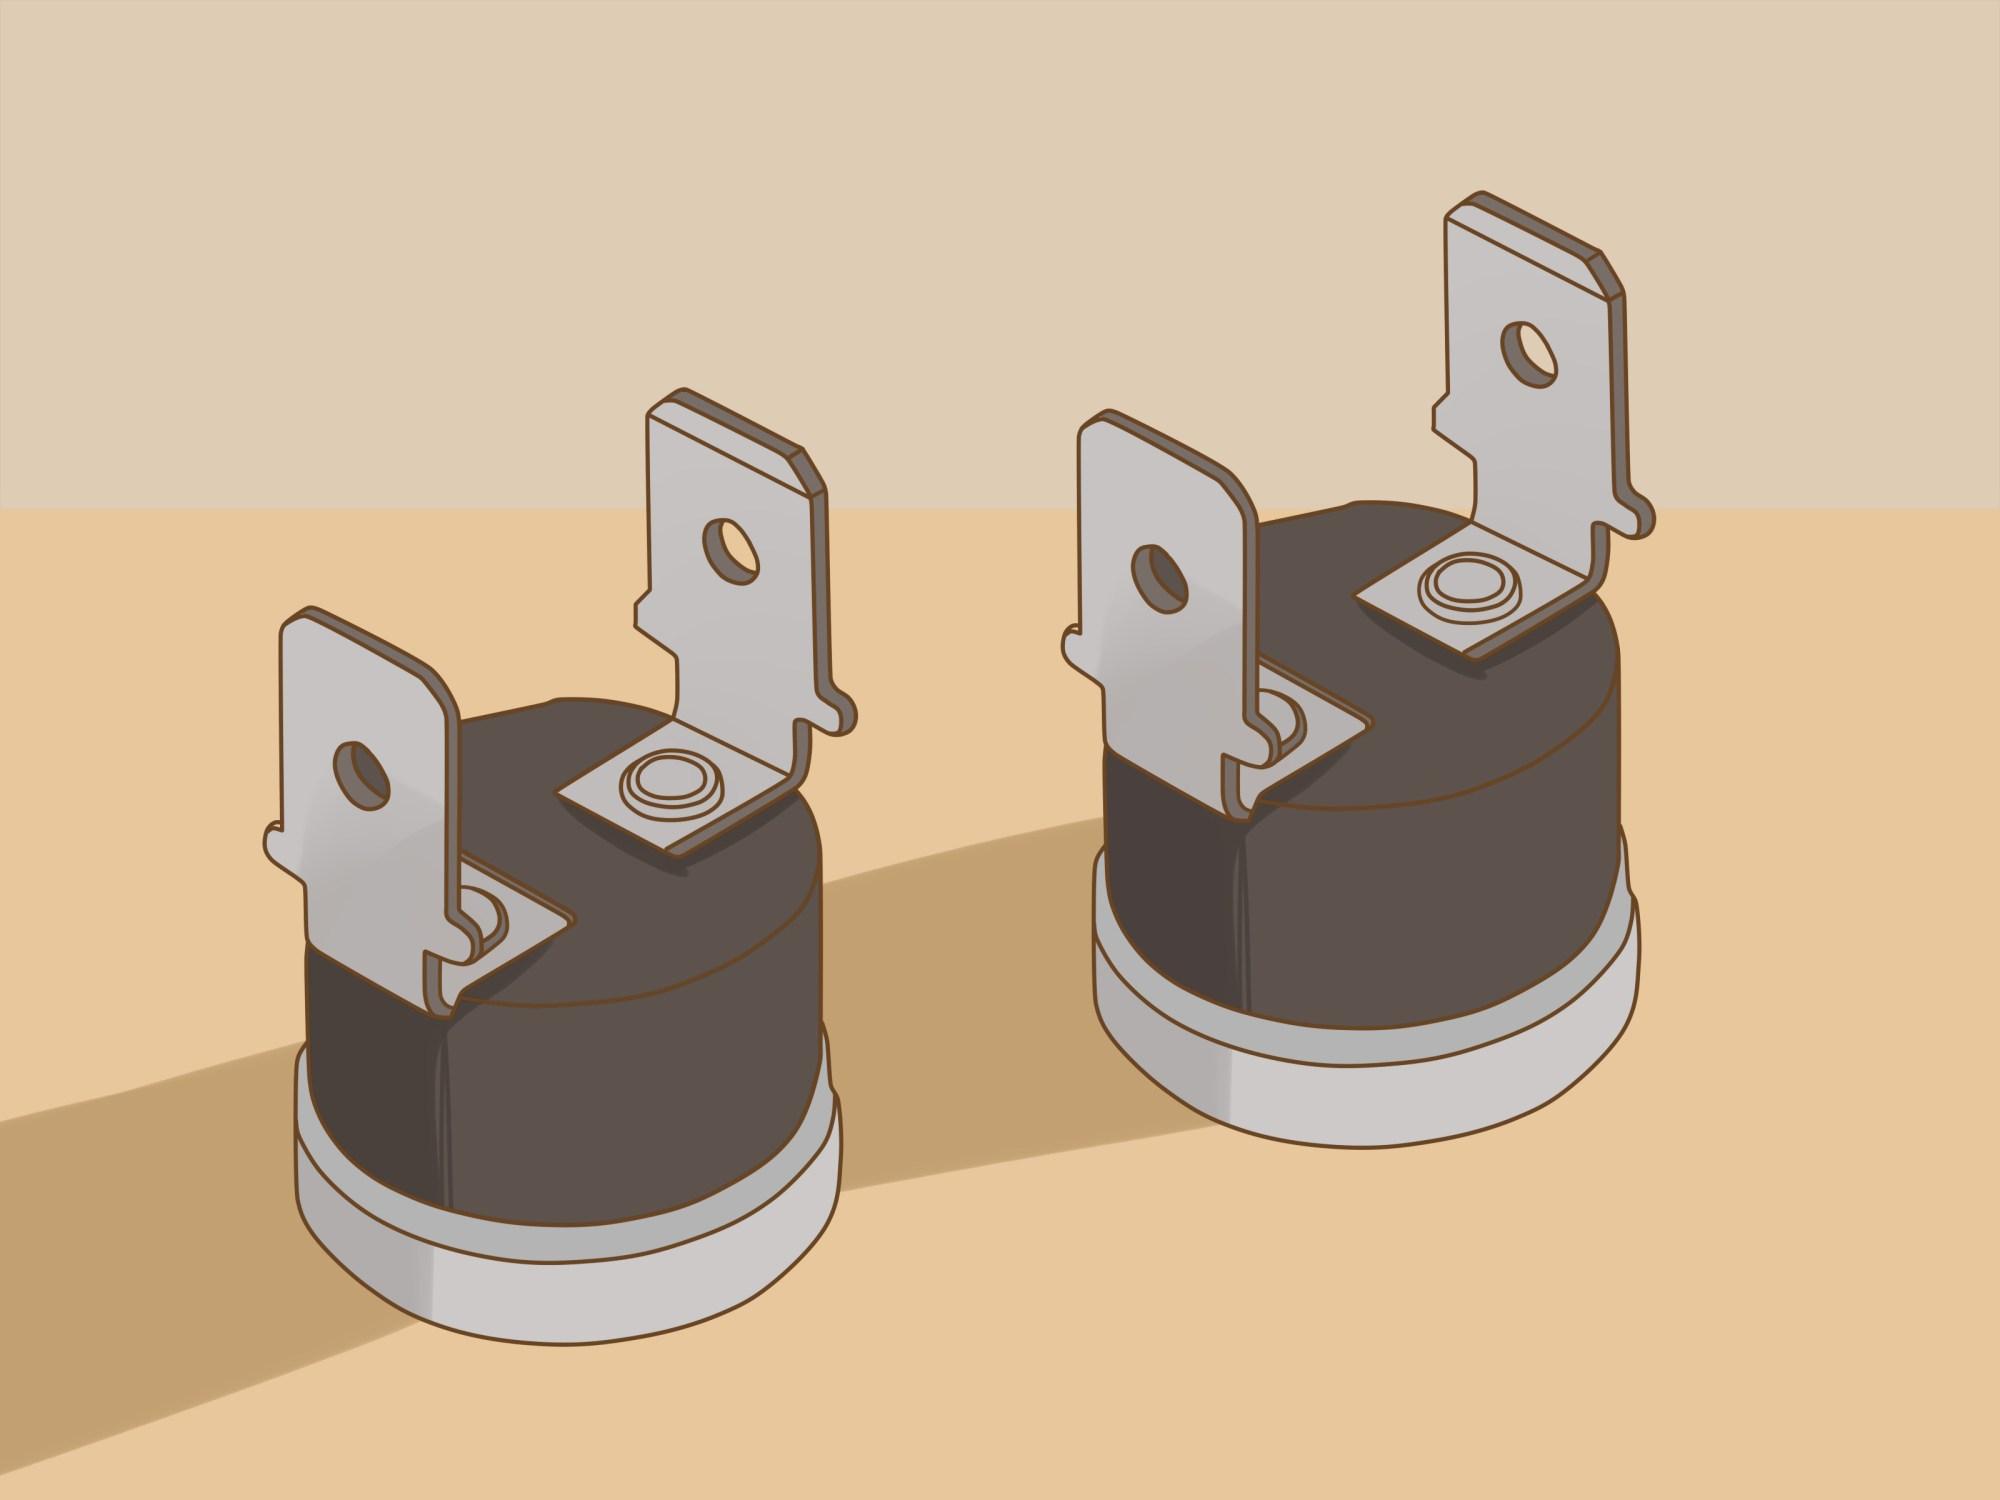 hight resolution of fuse box repair clip